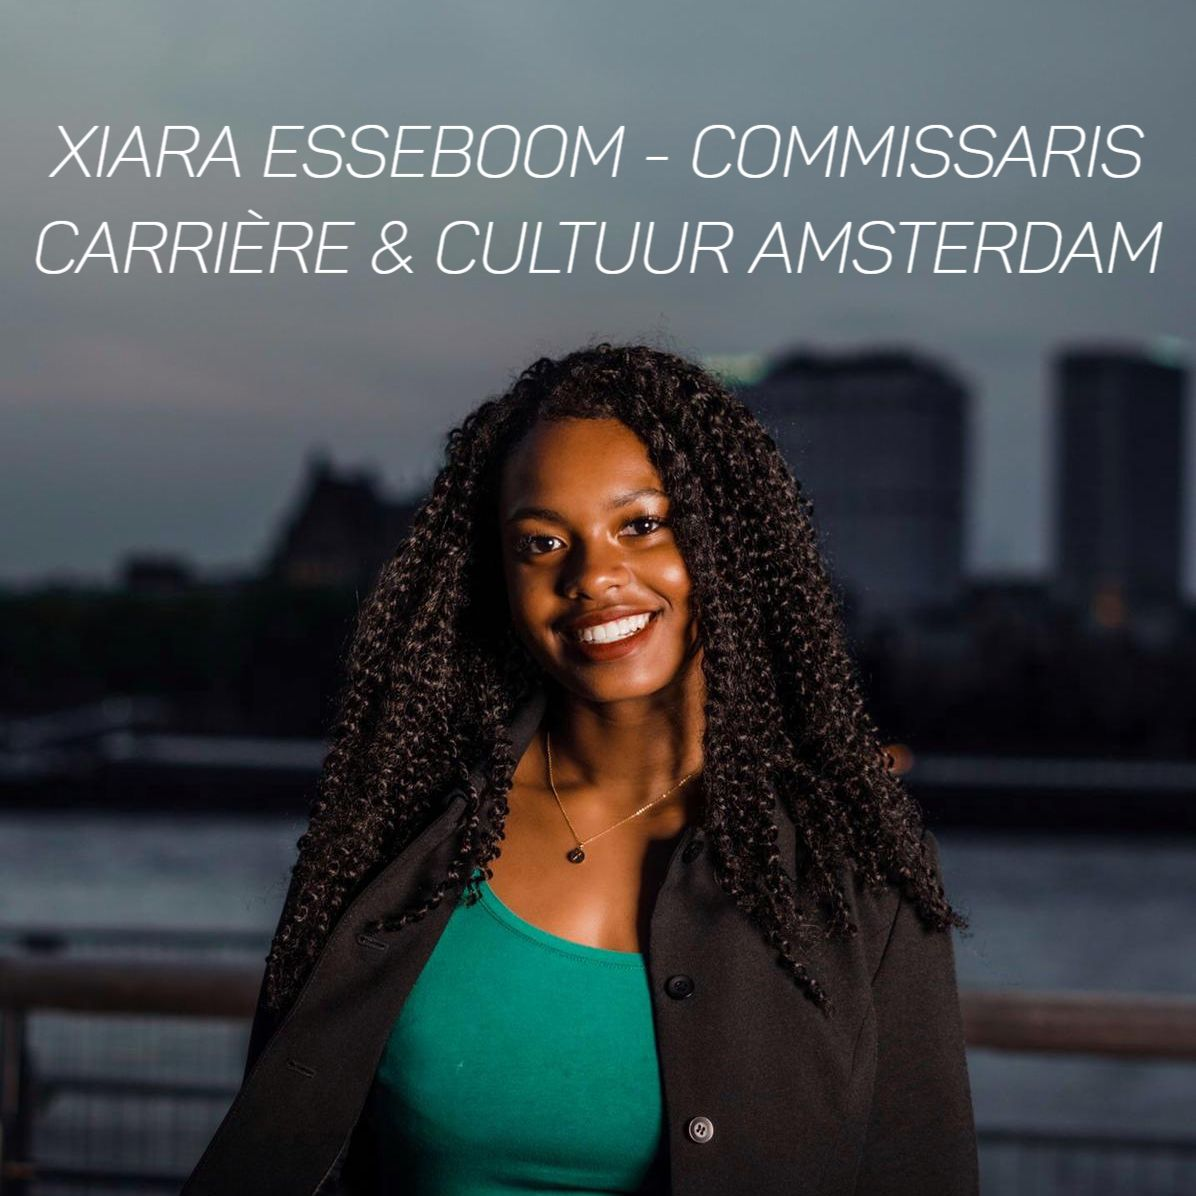 Xiara Esseboom